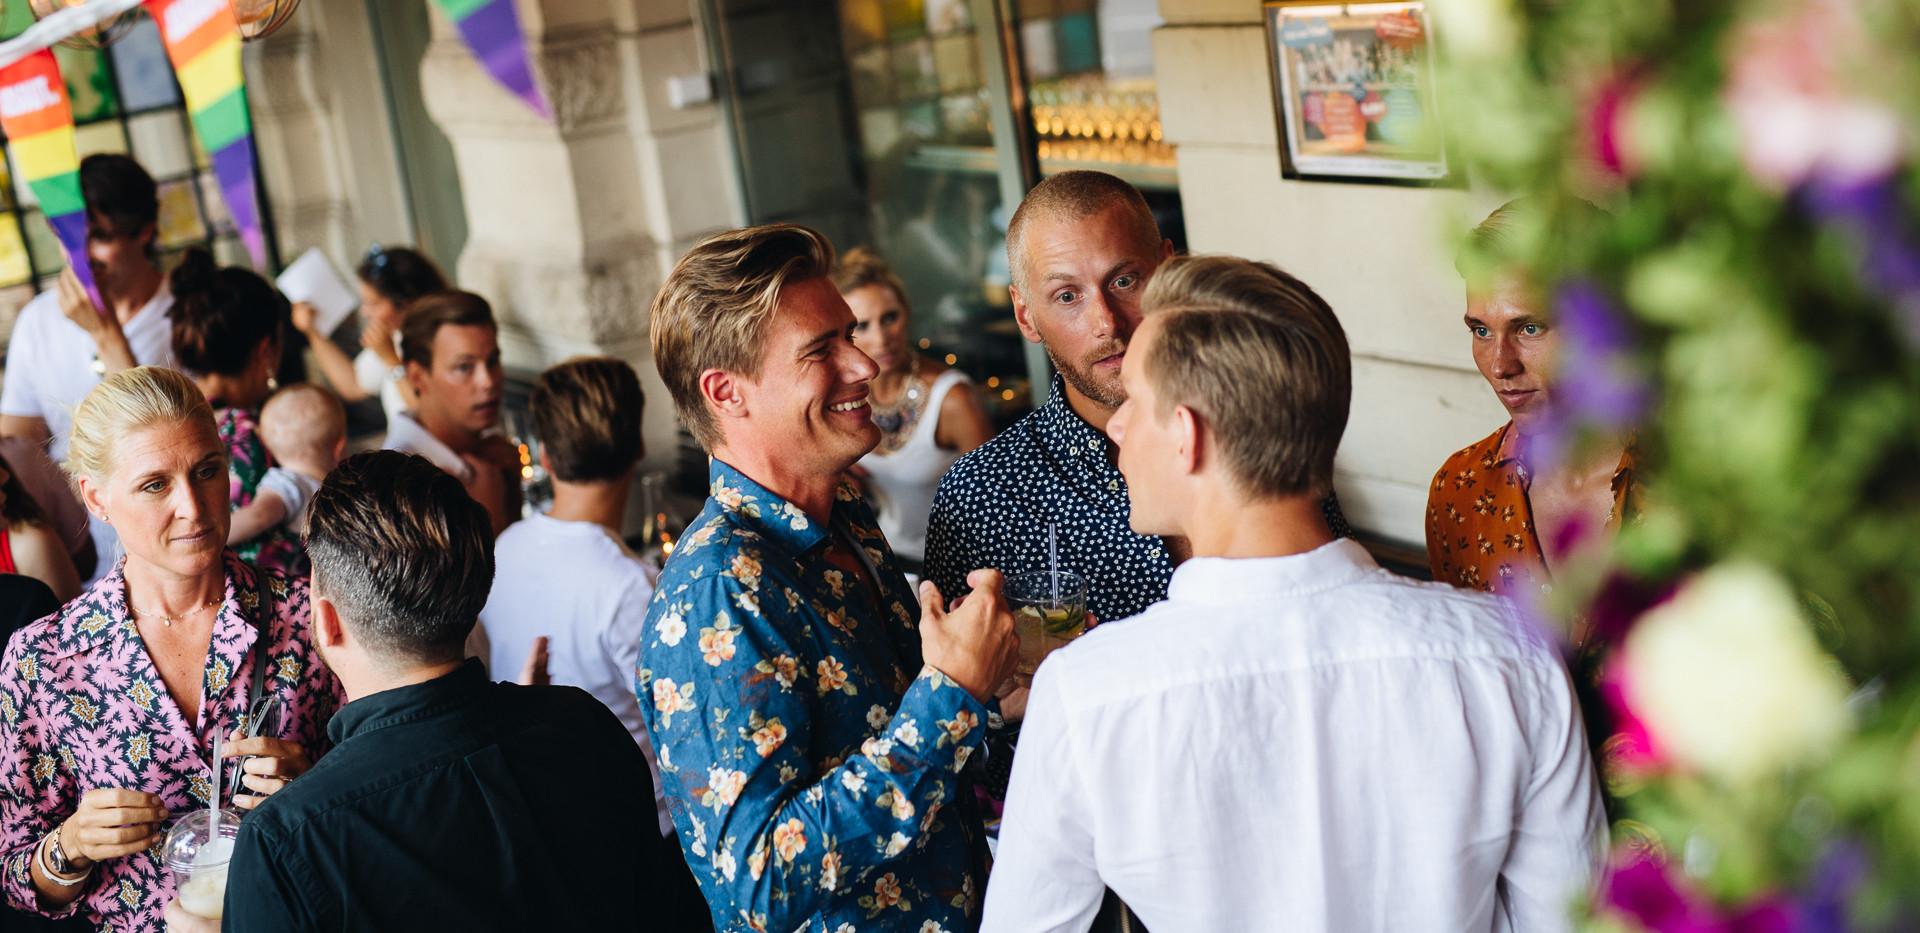 Event: Gayze. Photo: David Thunander